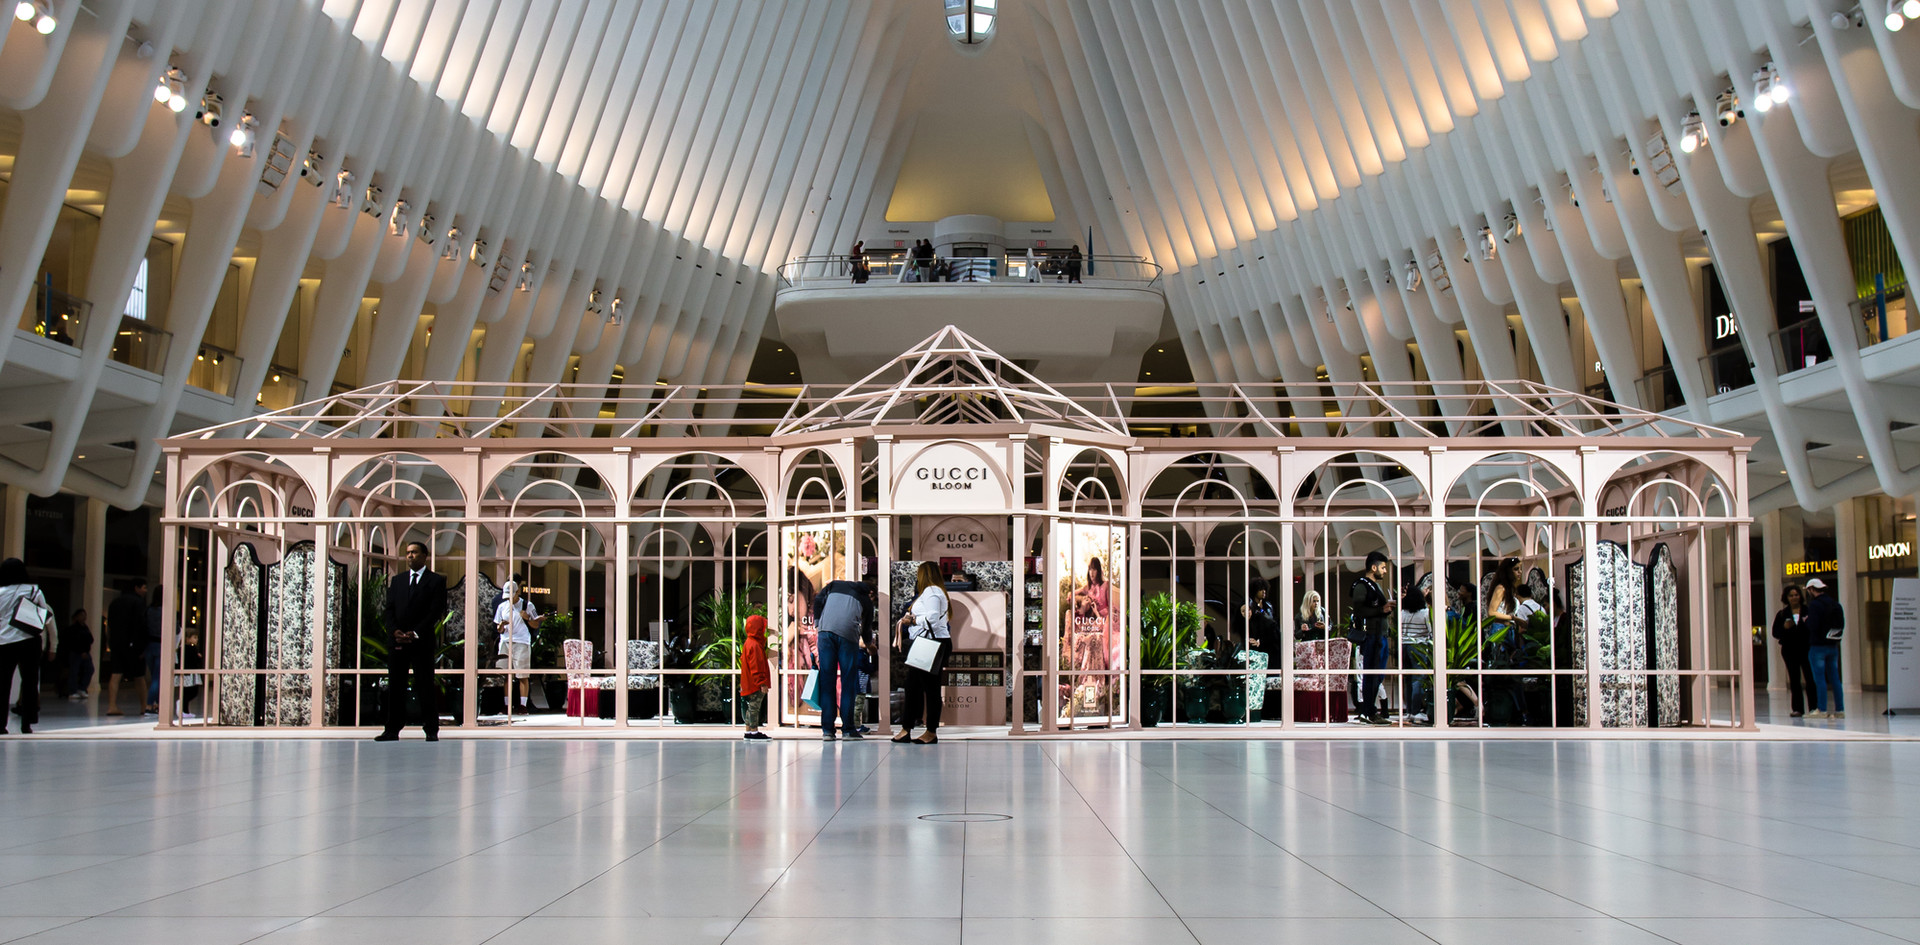 Oculus NYC Gucci event 2018